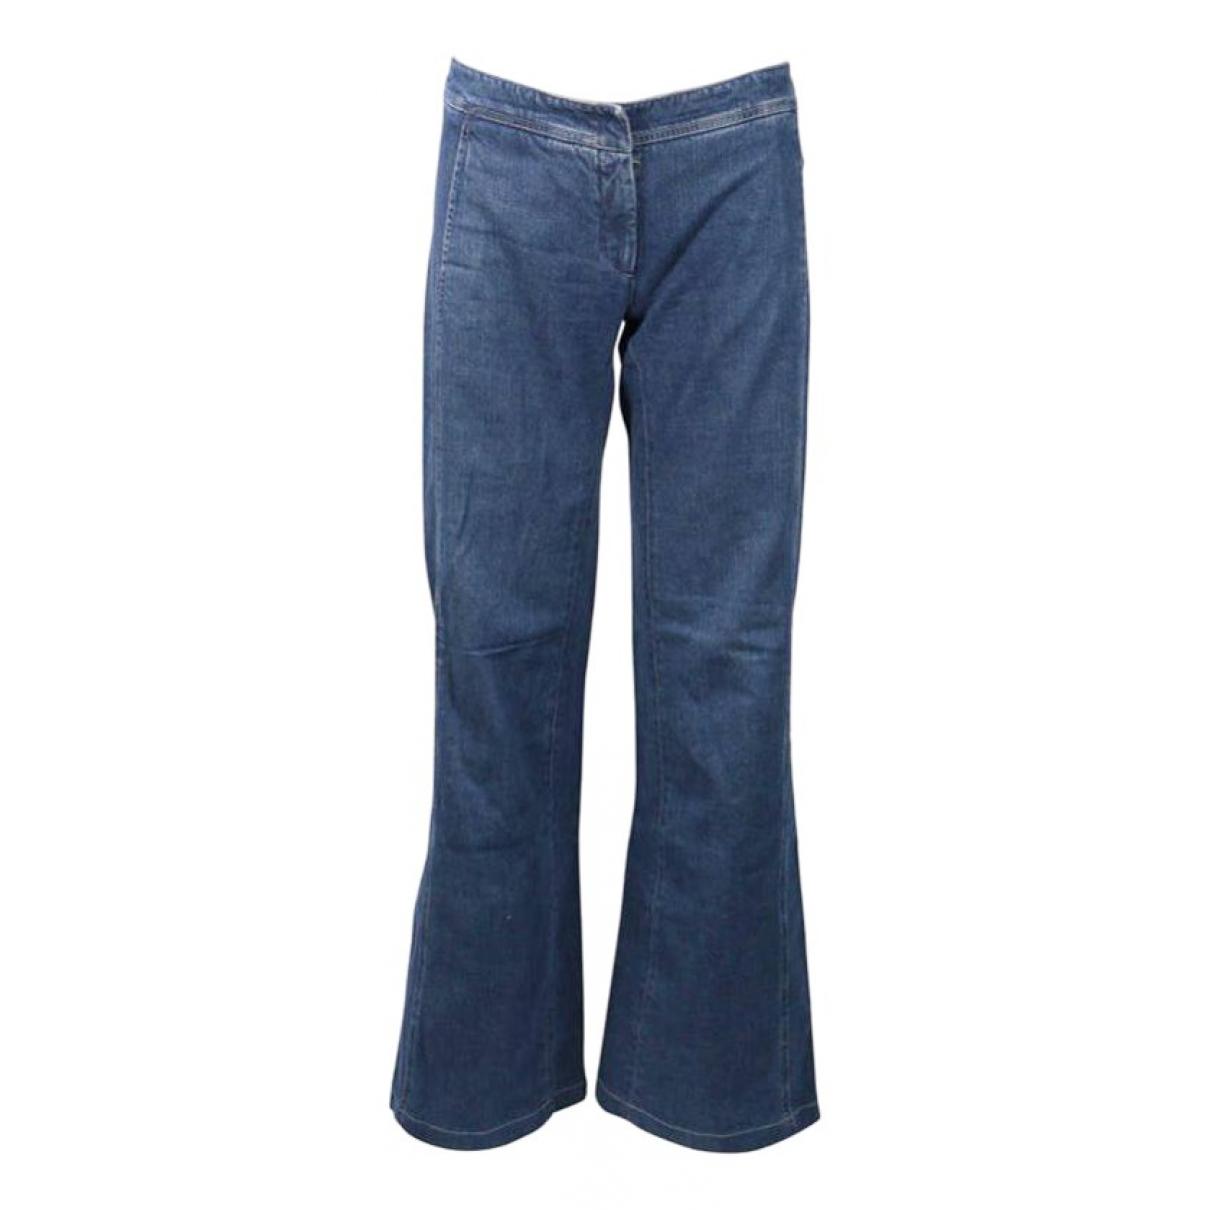 Chanel \N Blue Denim - Jeans Trousers for Women 42 FR